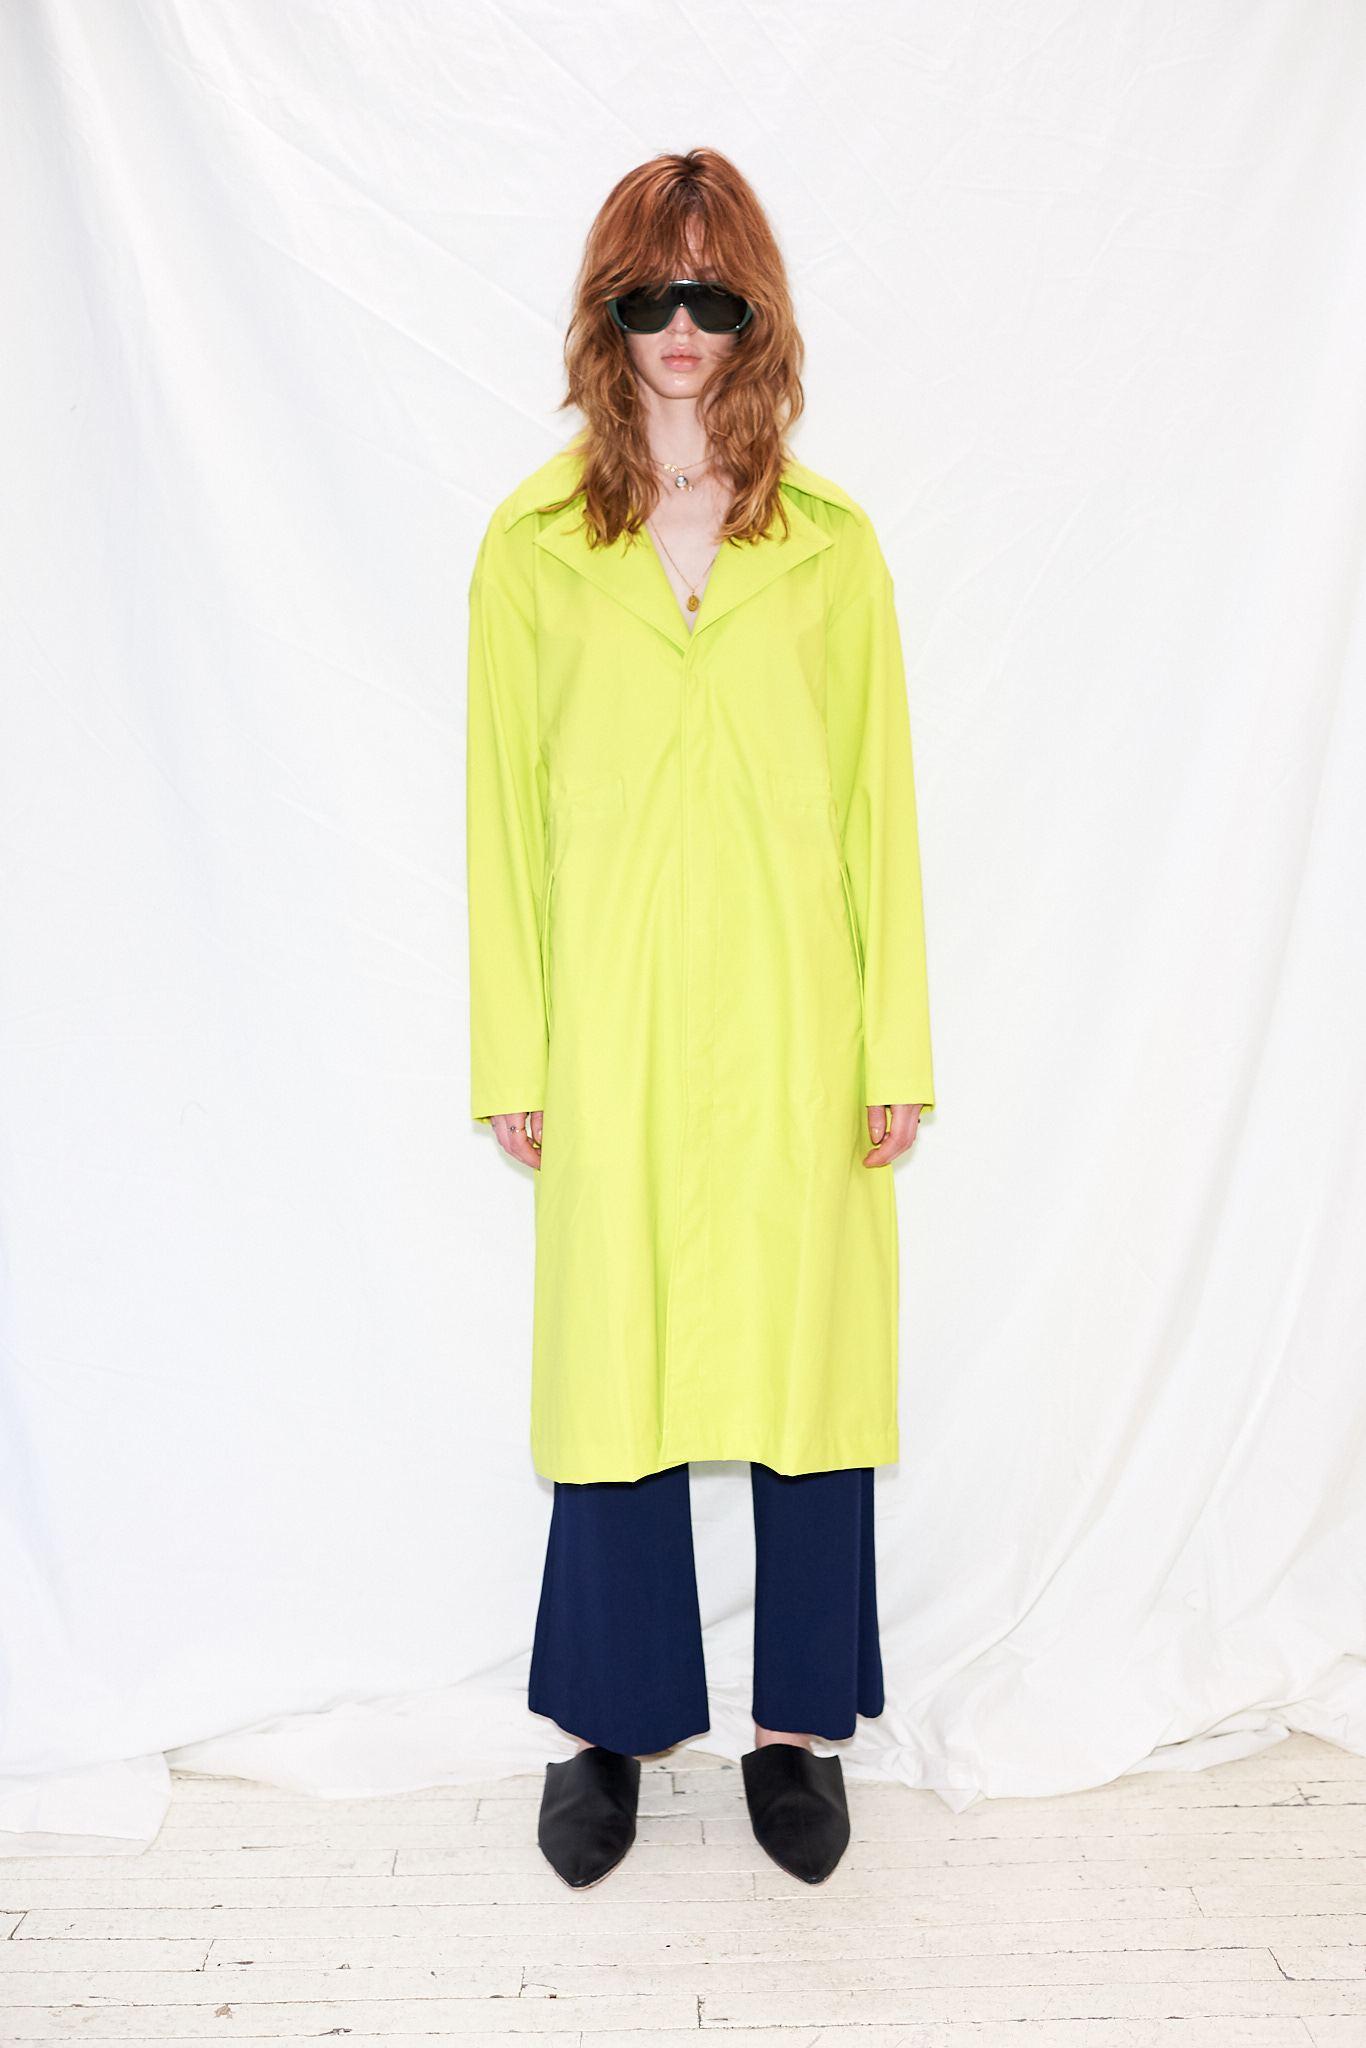 653440f3 Rains Neon Yellow Ltd Curve Coat in Yellow - Lyst